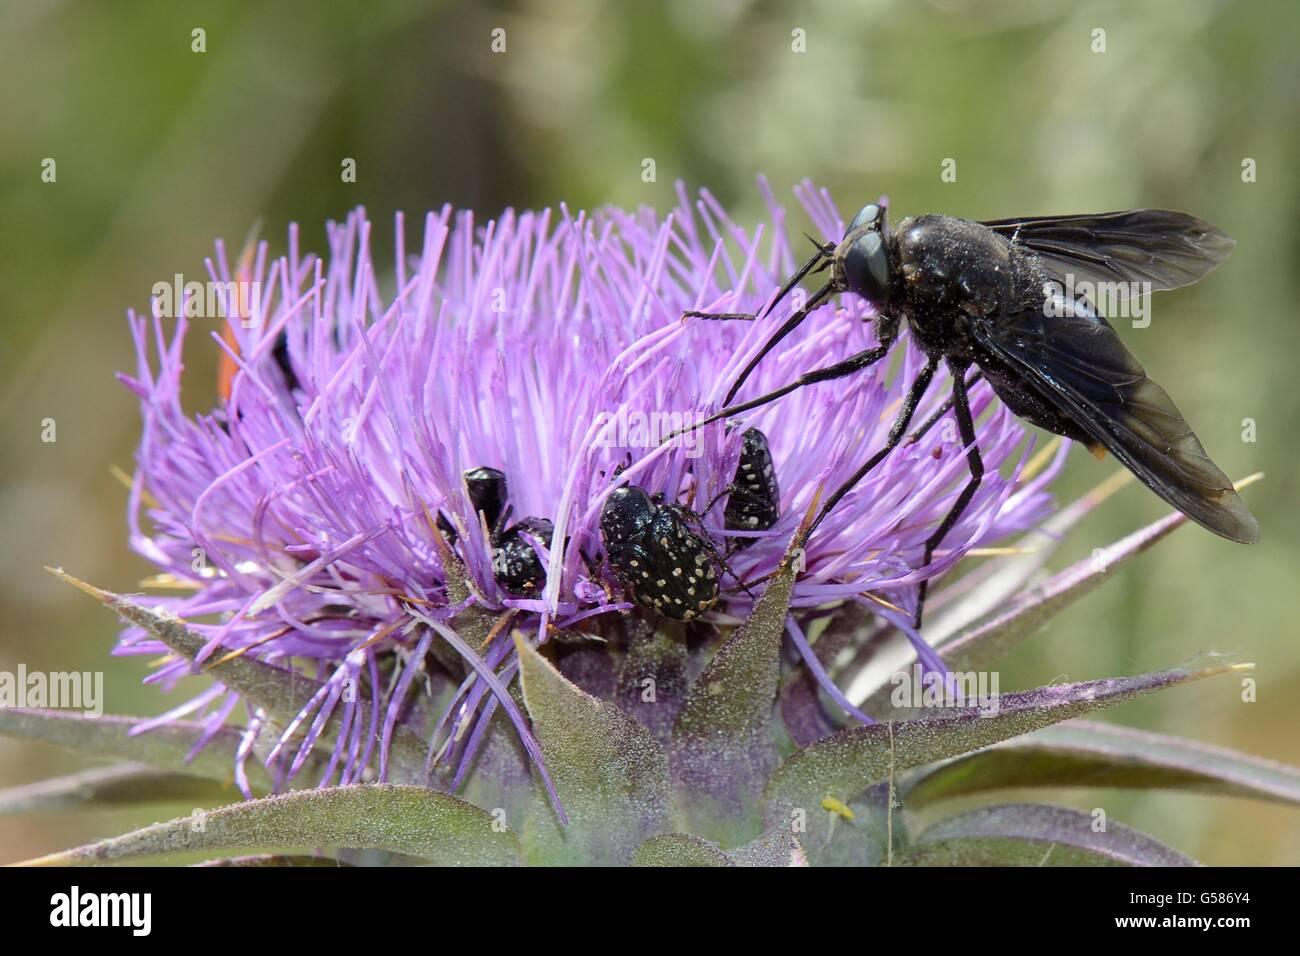 A nectar-feeding species of Horse fly (Pangonius funebris) using its long proboscis to forage on Milk thistle (Carduus - Stock Image